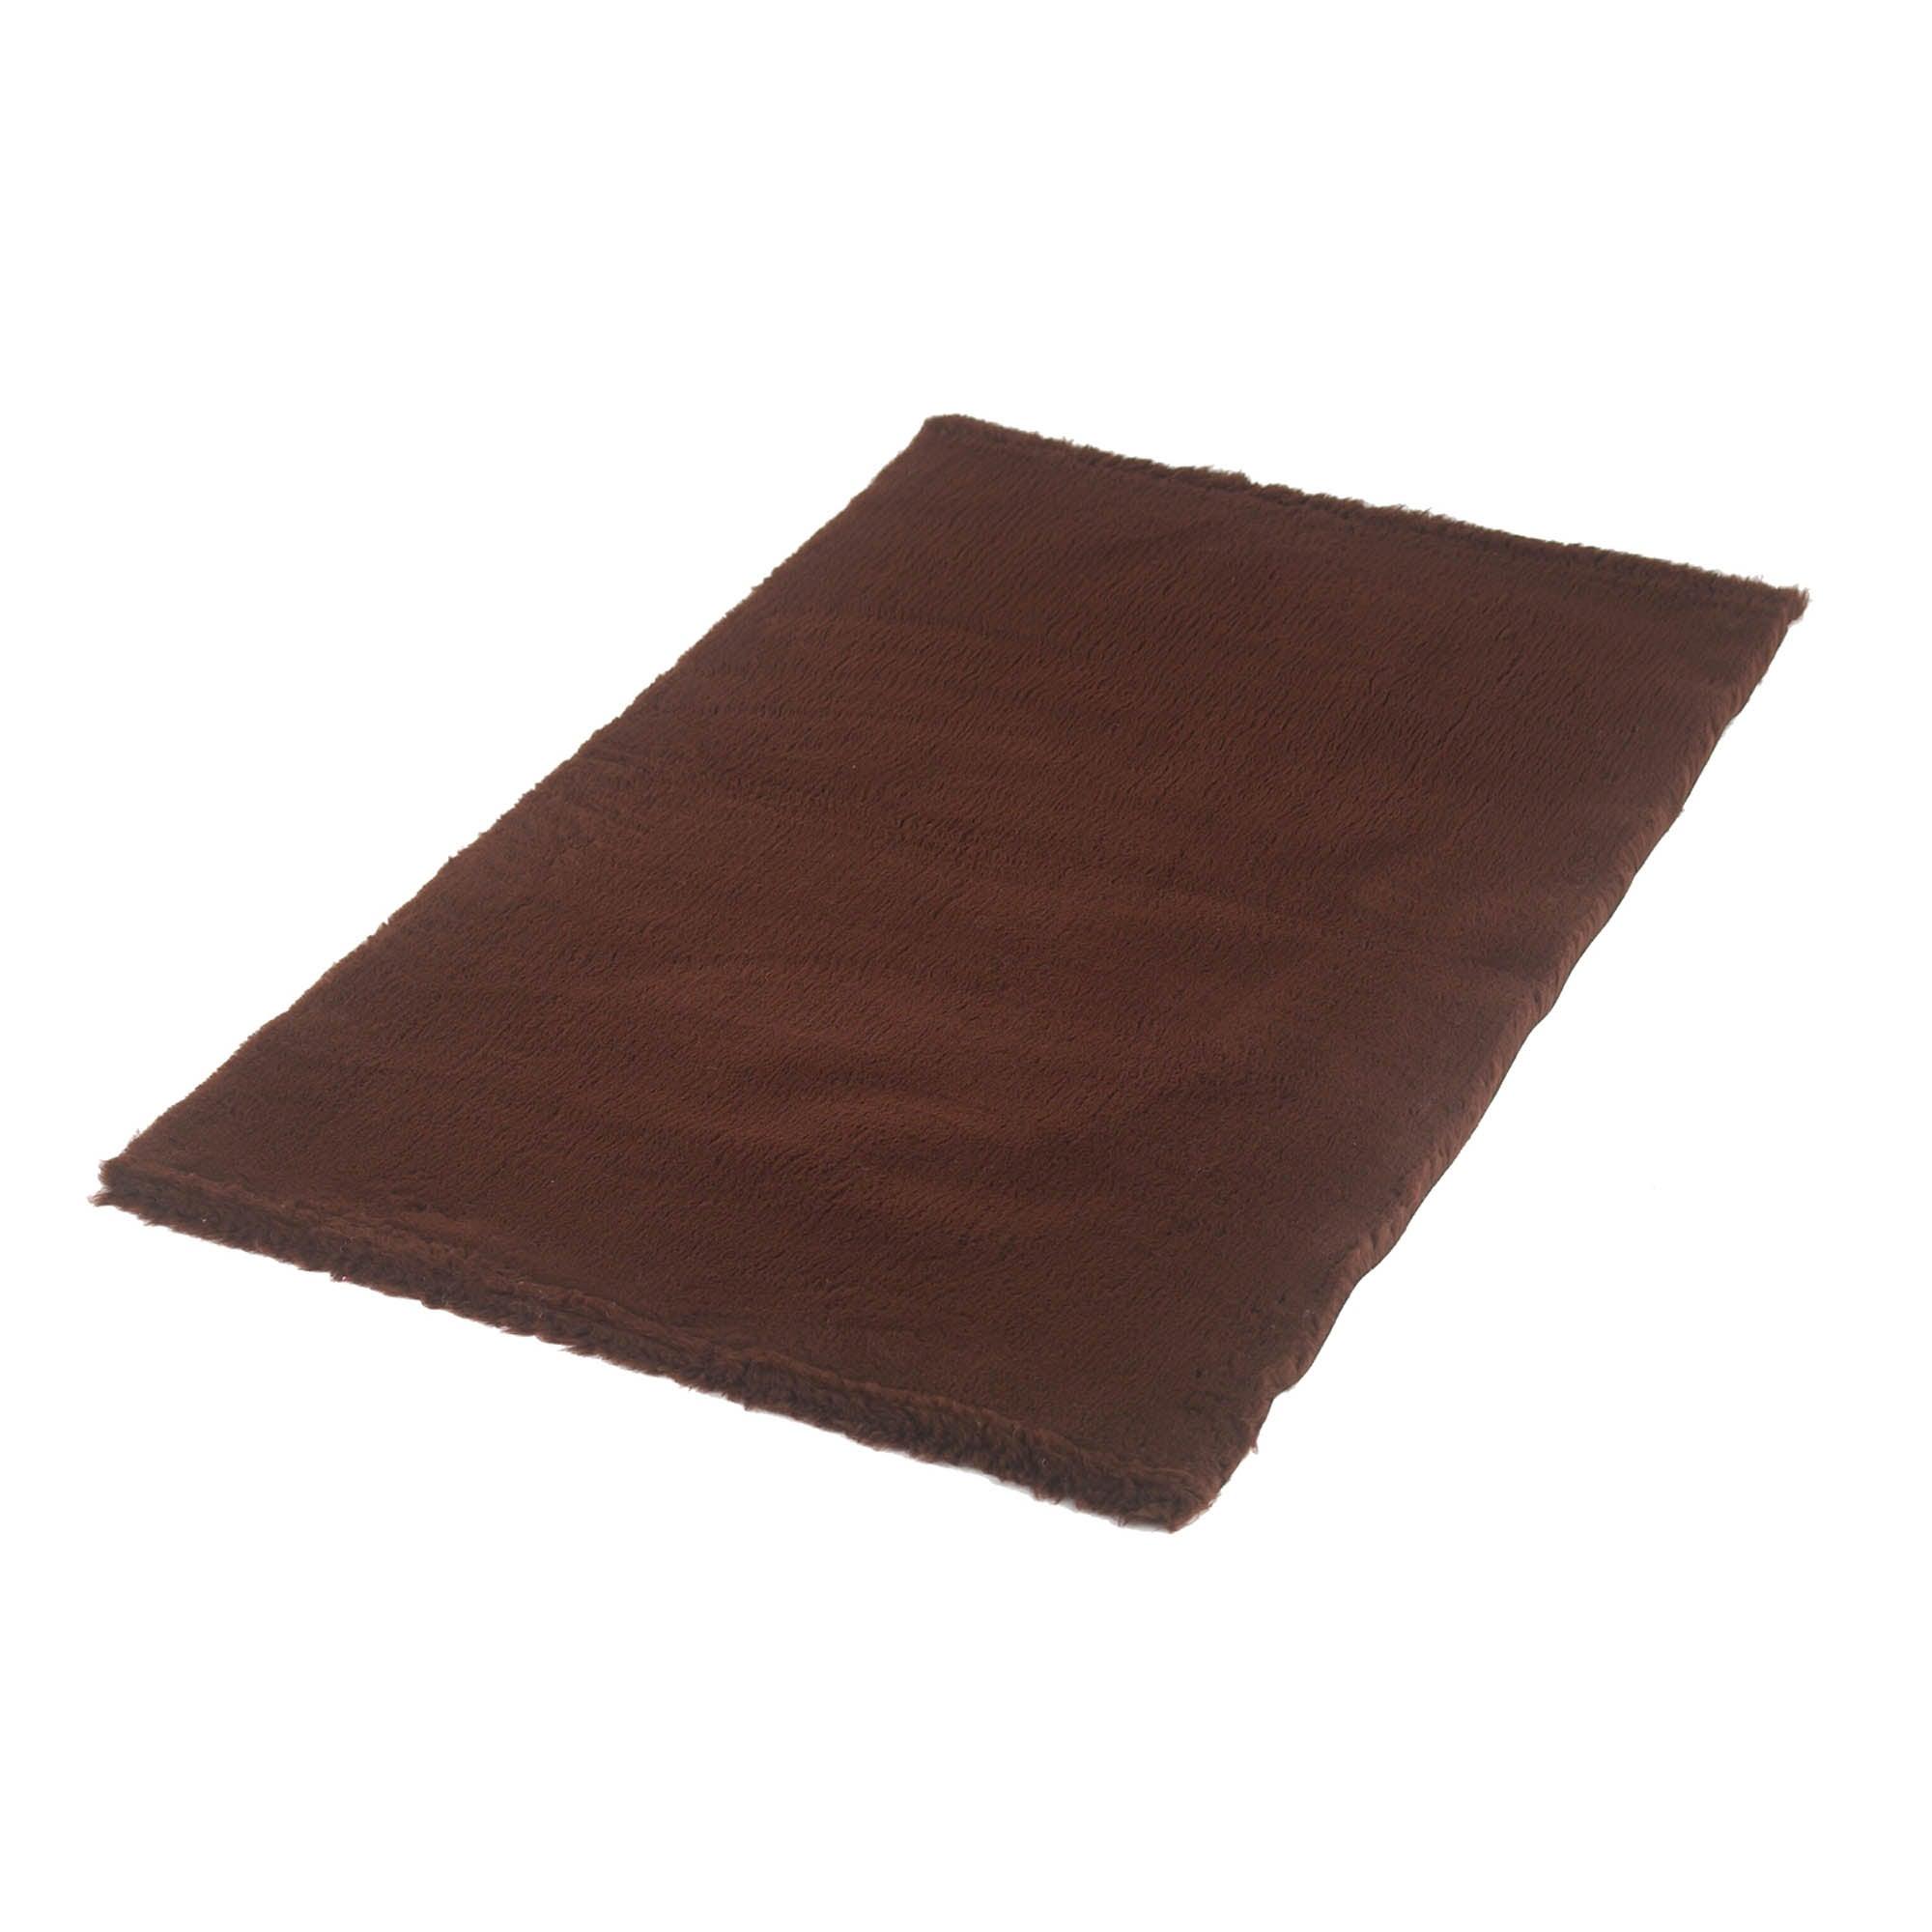 Brown Traditional Pet Vet Bedding Burnt Umber (Brown)